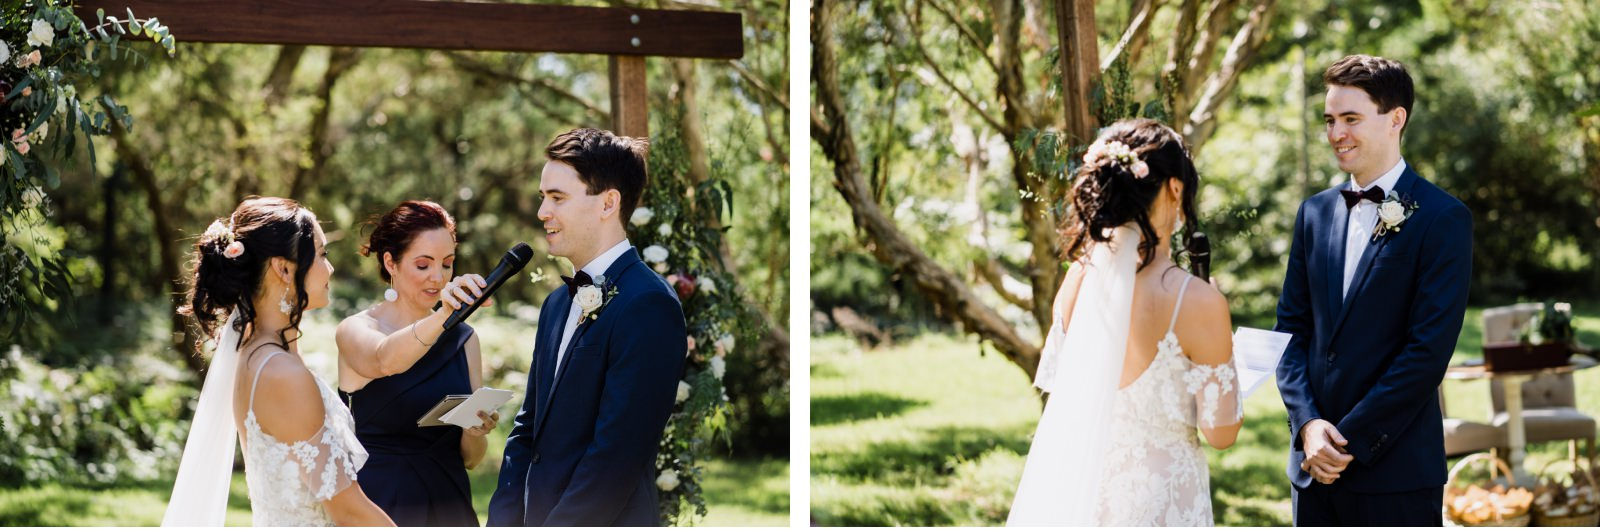 wollombi-wedding-photography-hunter-valley-wedding-photographers-30